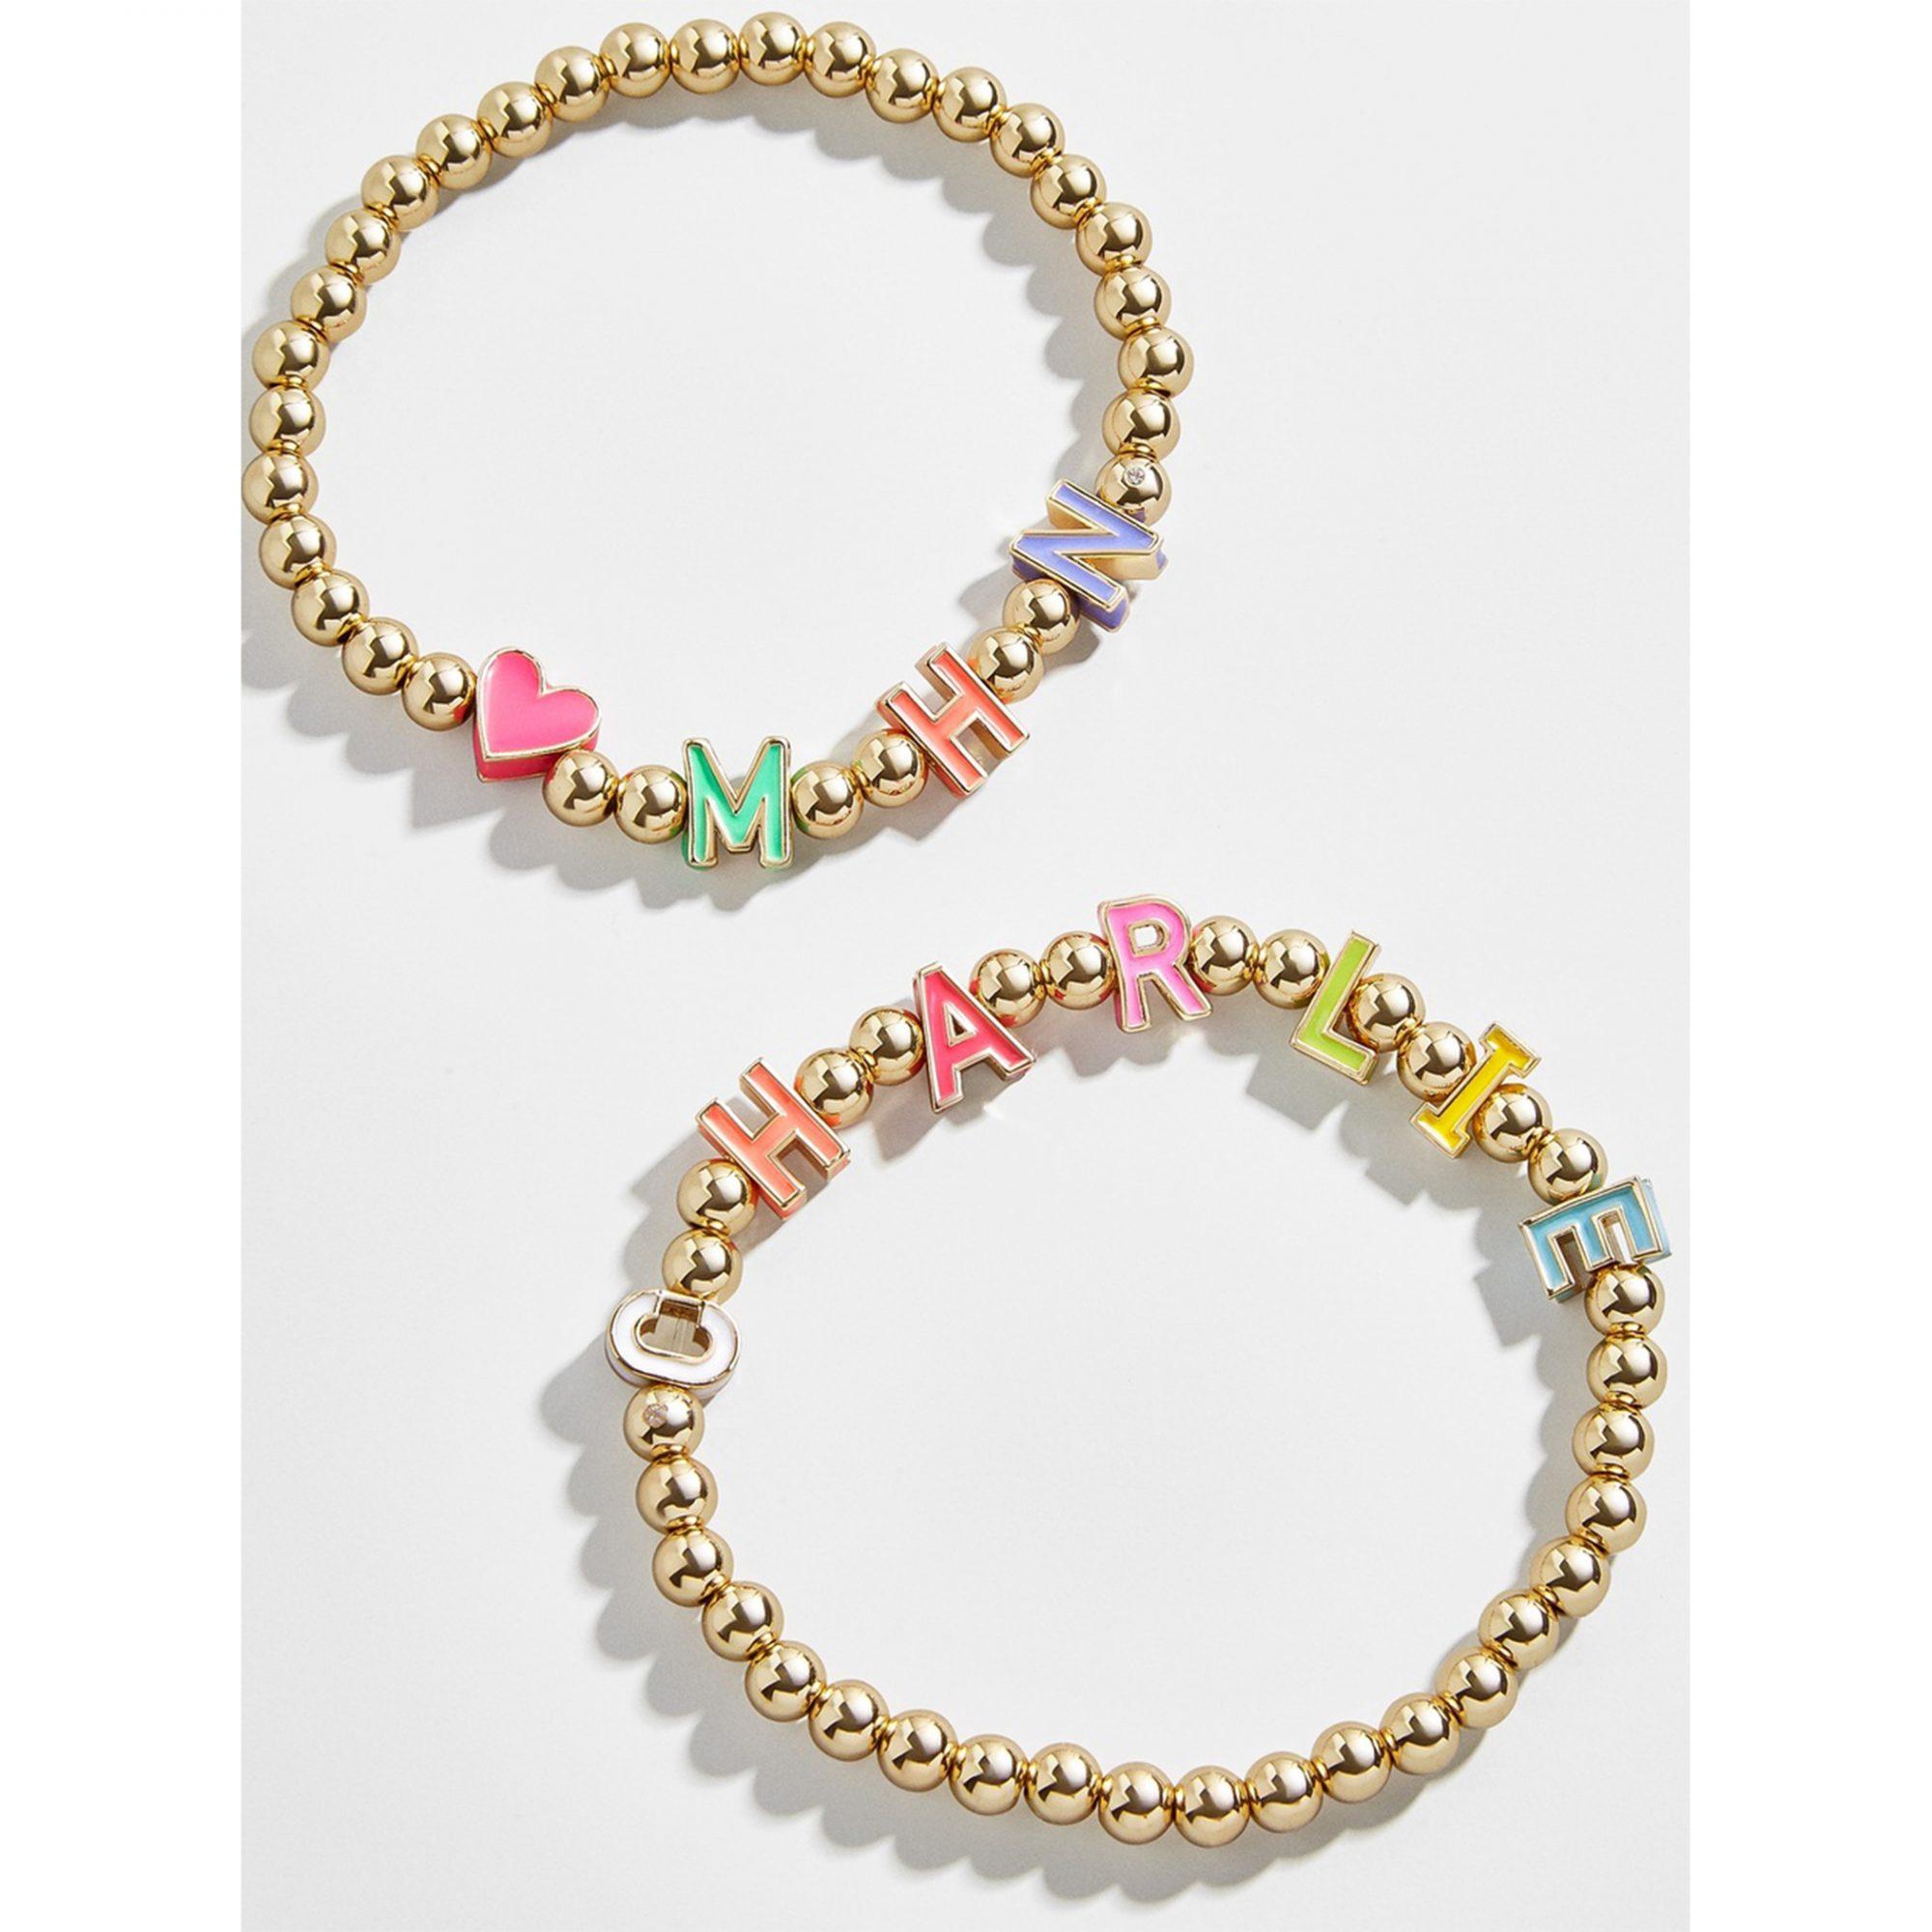 baublebar-custom-pisa-bracelet, best-friend-gift-ideas